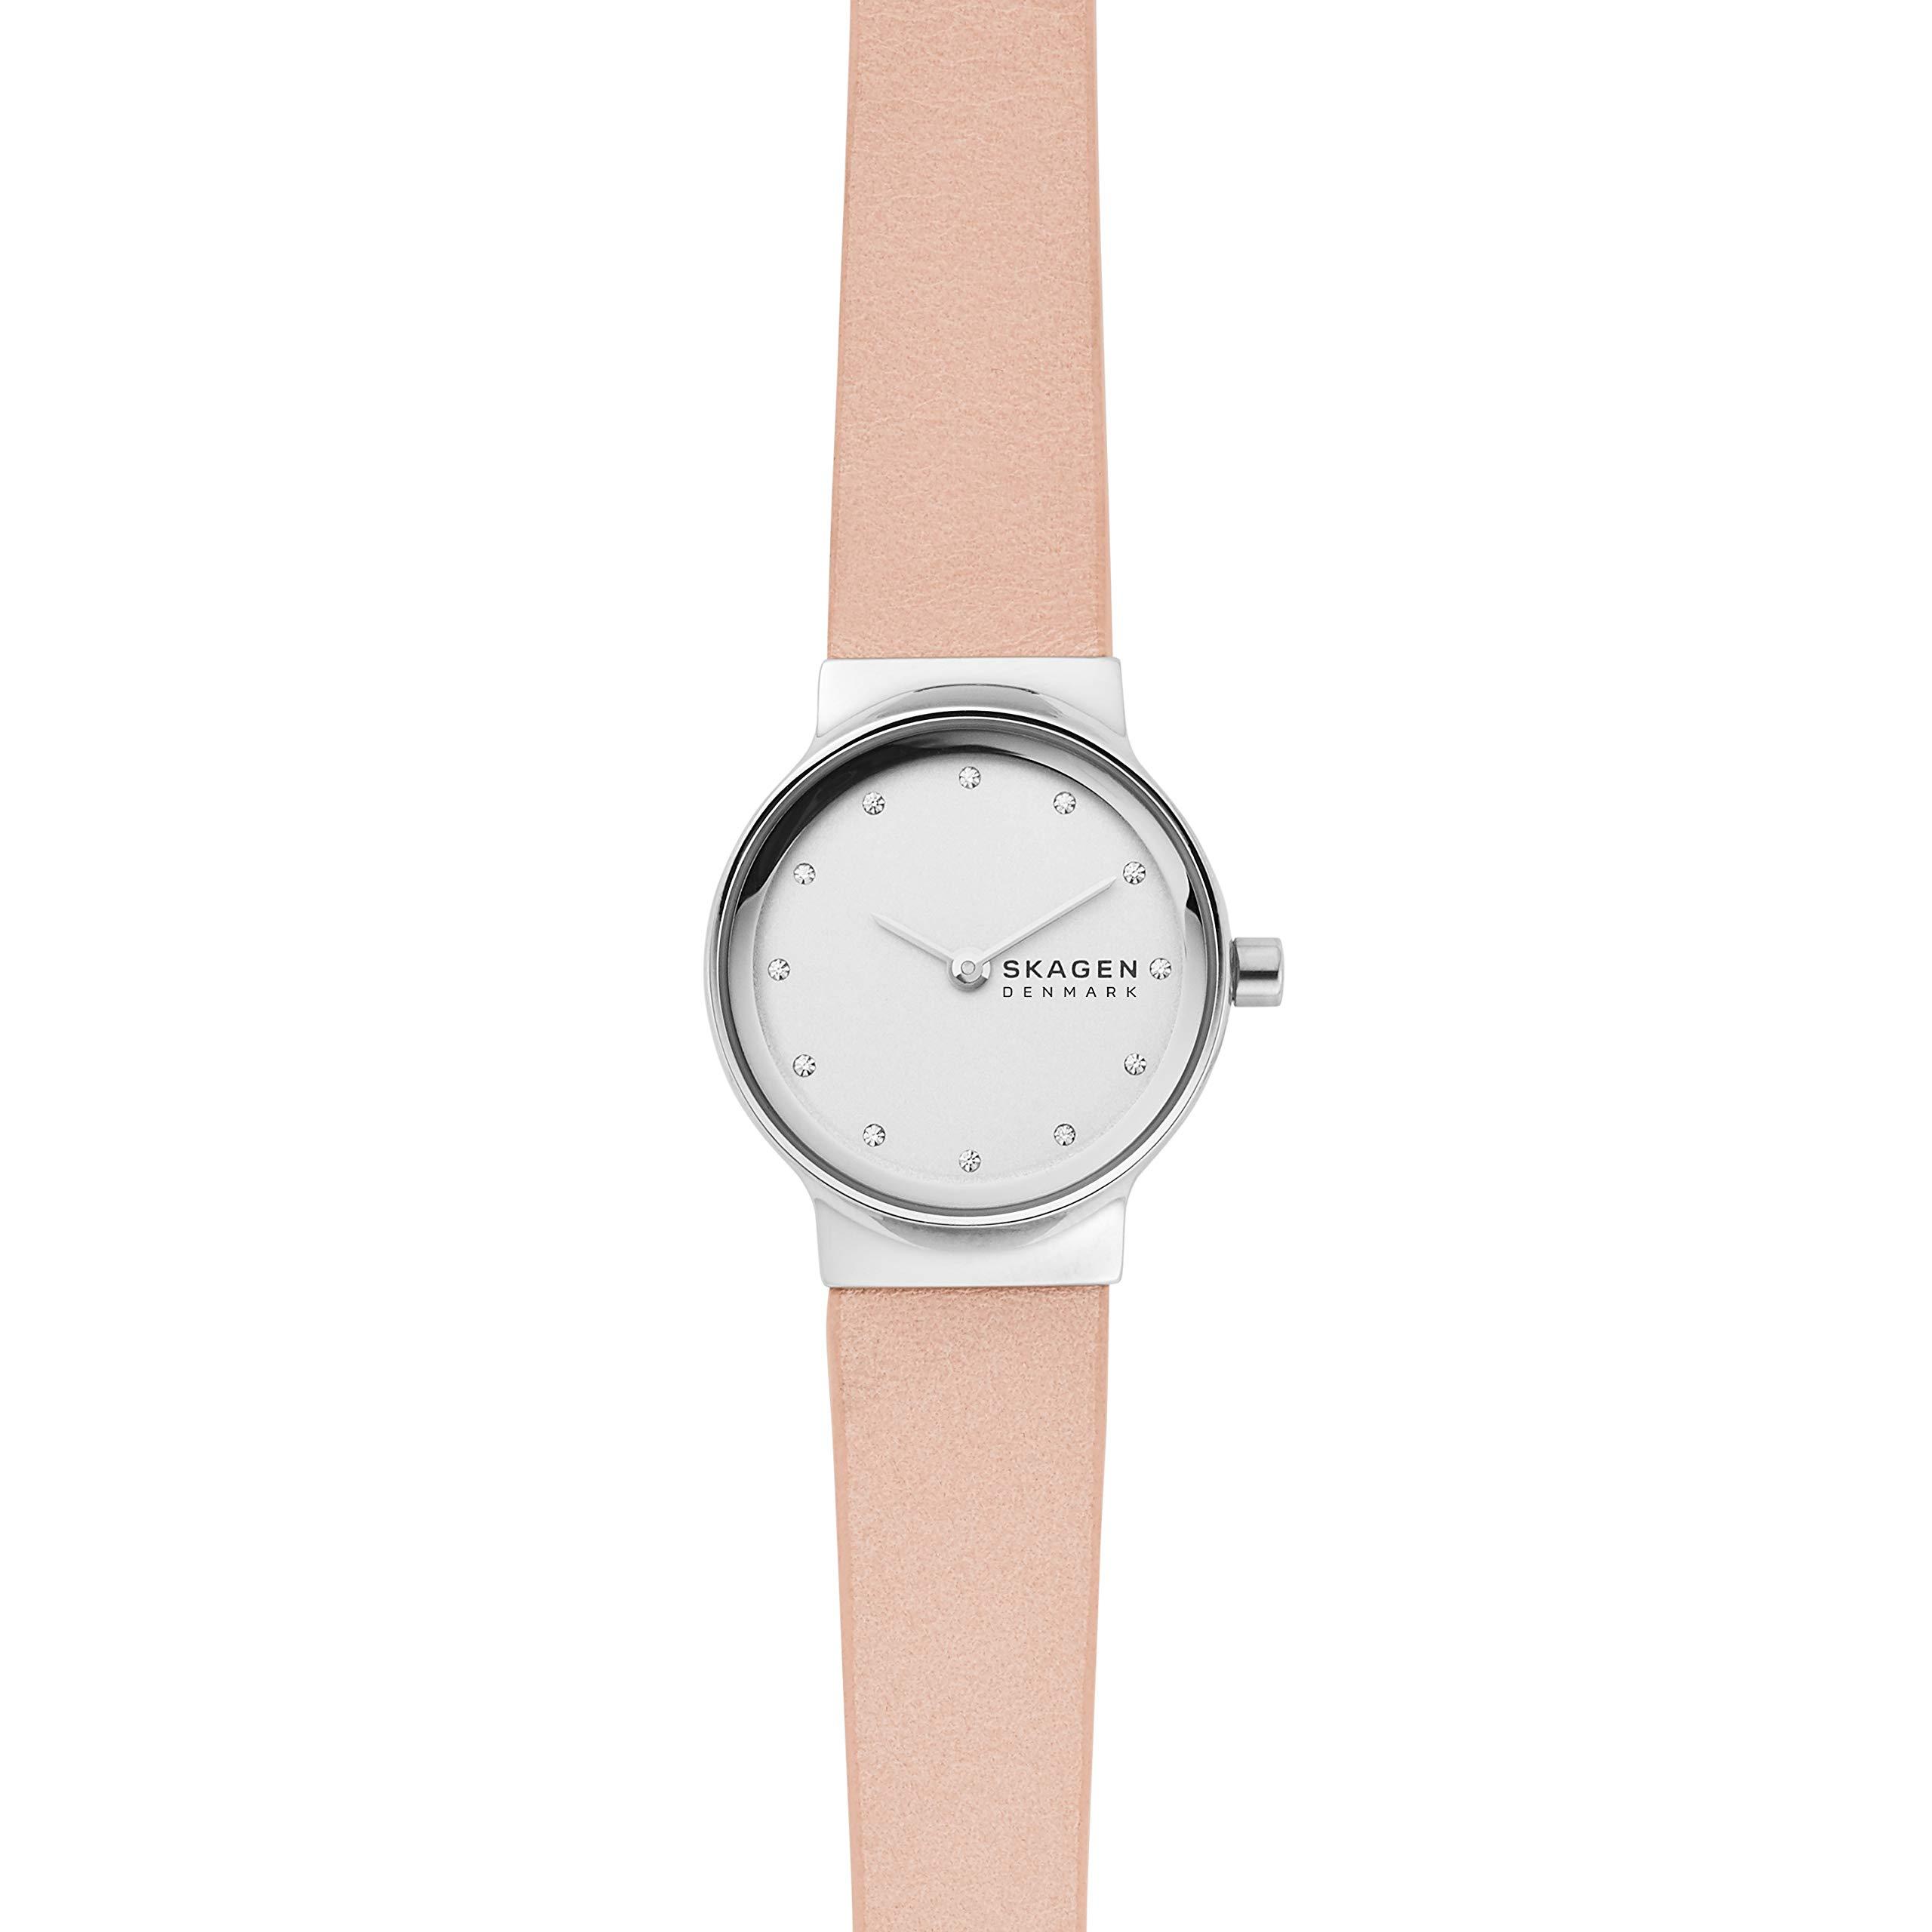 Skagen Womens Analogue Quartz Watch with Stainless Steel Strap